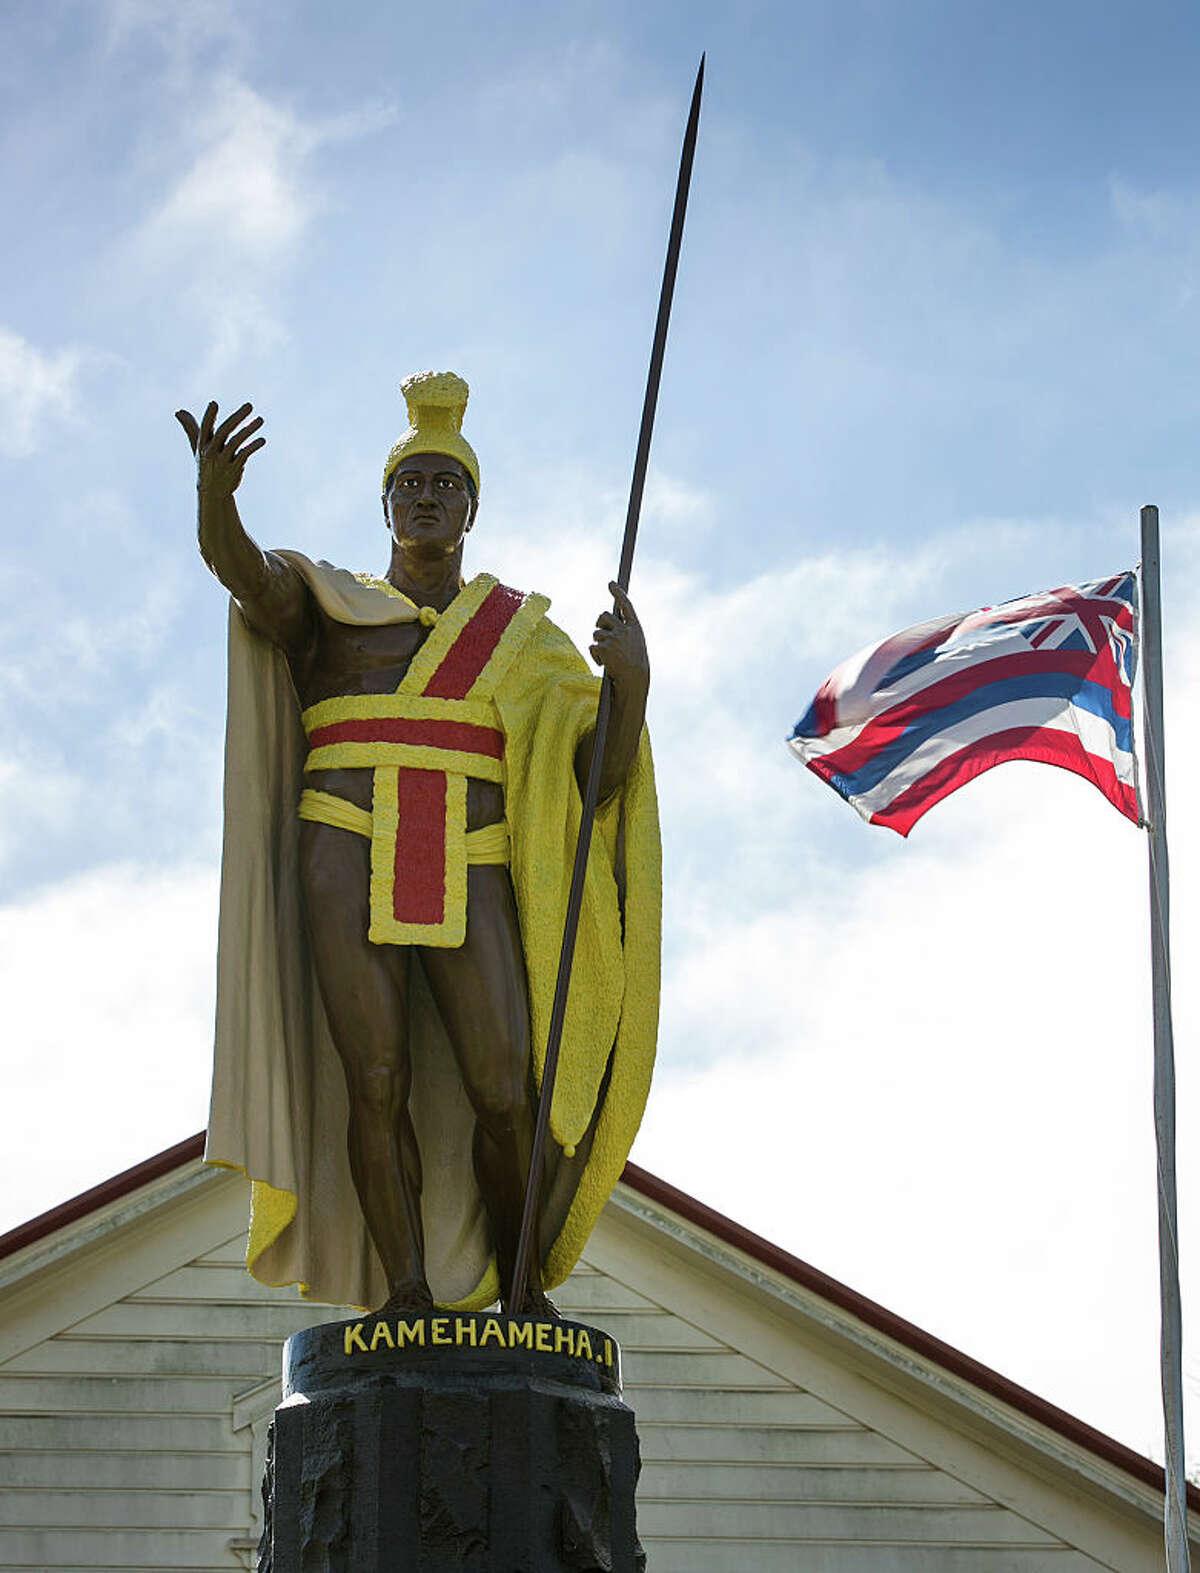 A statue of Hawaii's King Kamehameha in front of his birthplace in Kapaau on the Kohala Coast, Hawaii.